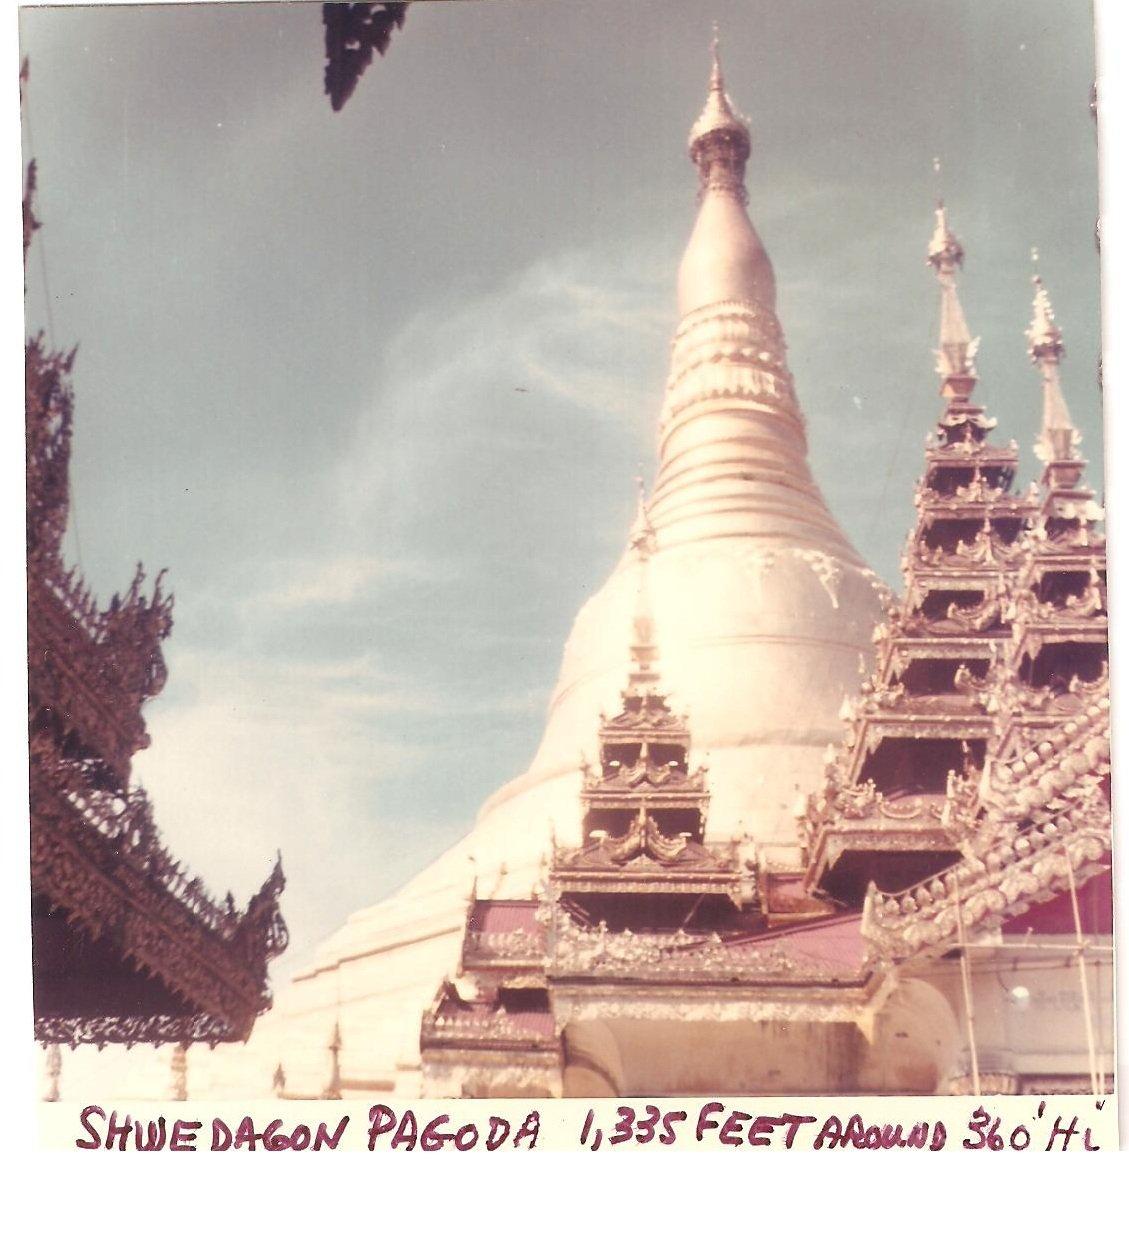 Vintage Photograph Burma Shwe Dagon Pagoda 1335 ft 1968 Myanmar